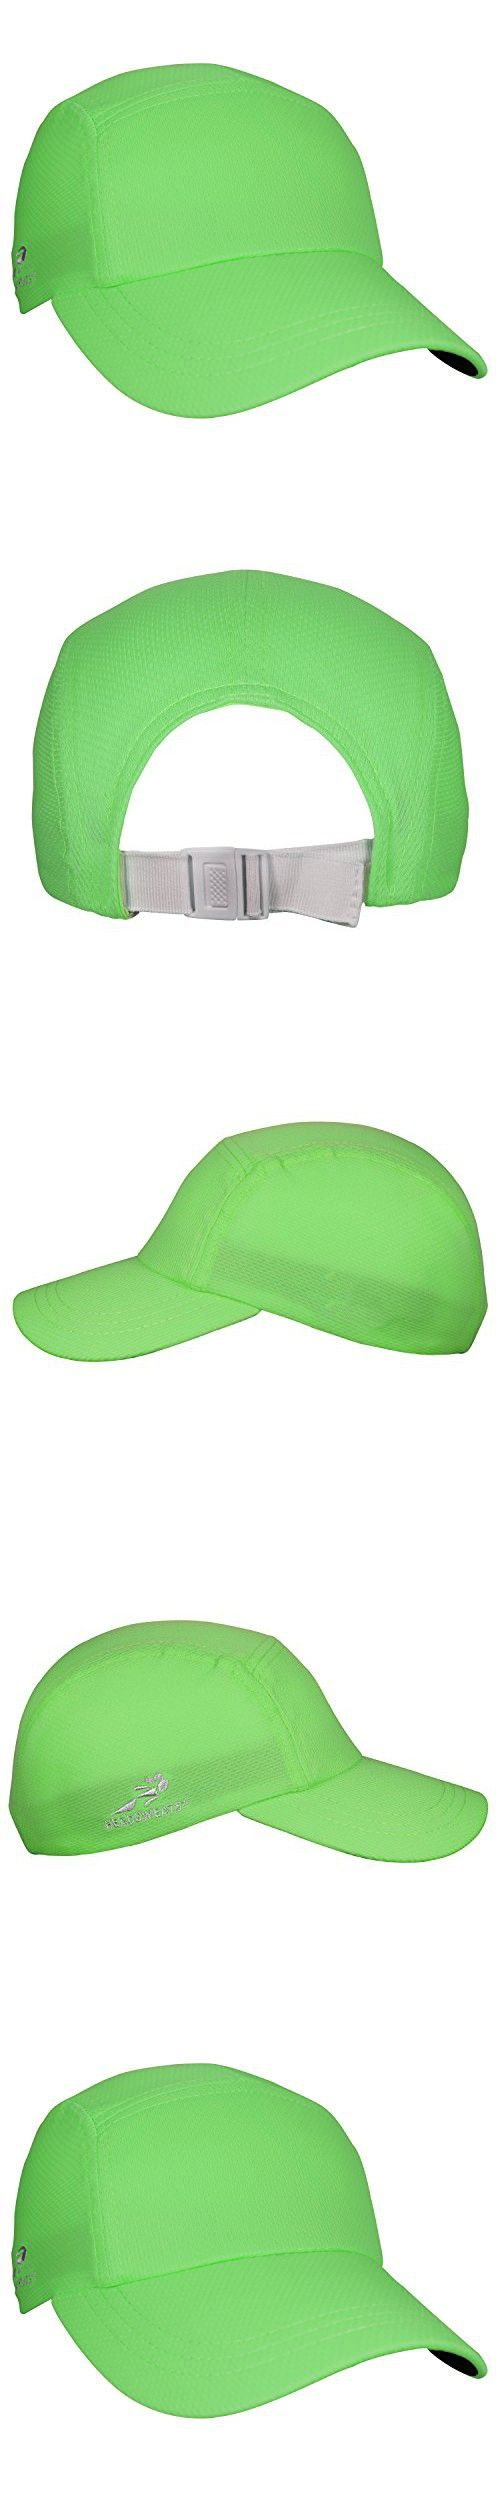 Headsweats Performance Race/Running/Outdoor Sports Hat, Limeade